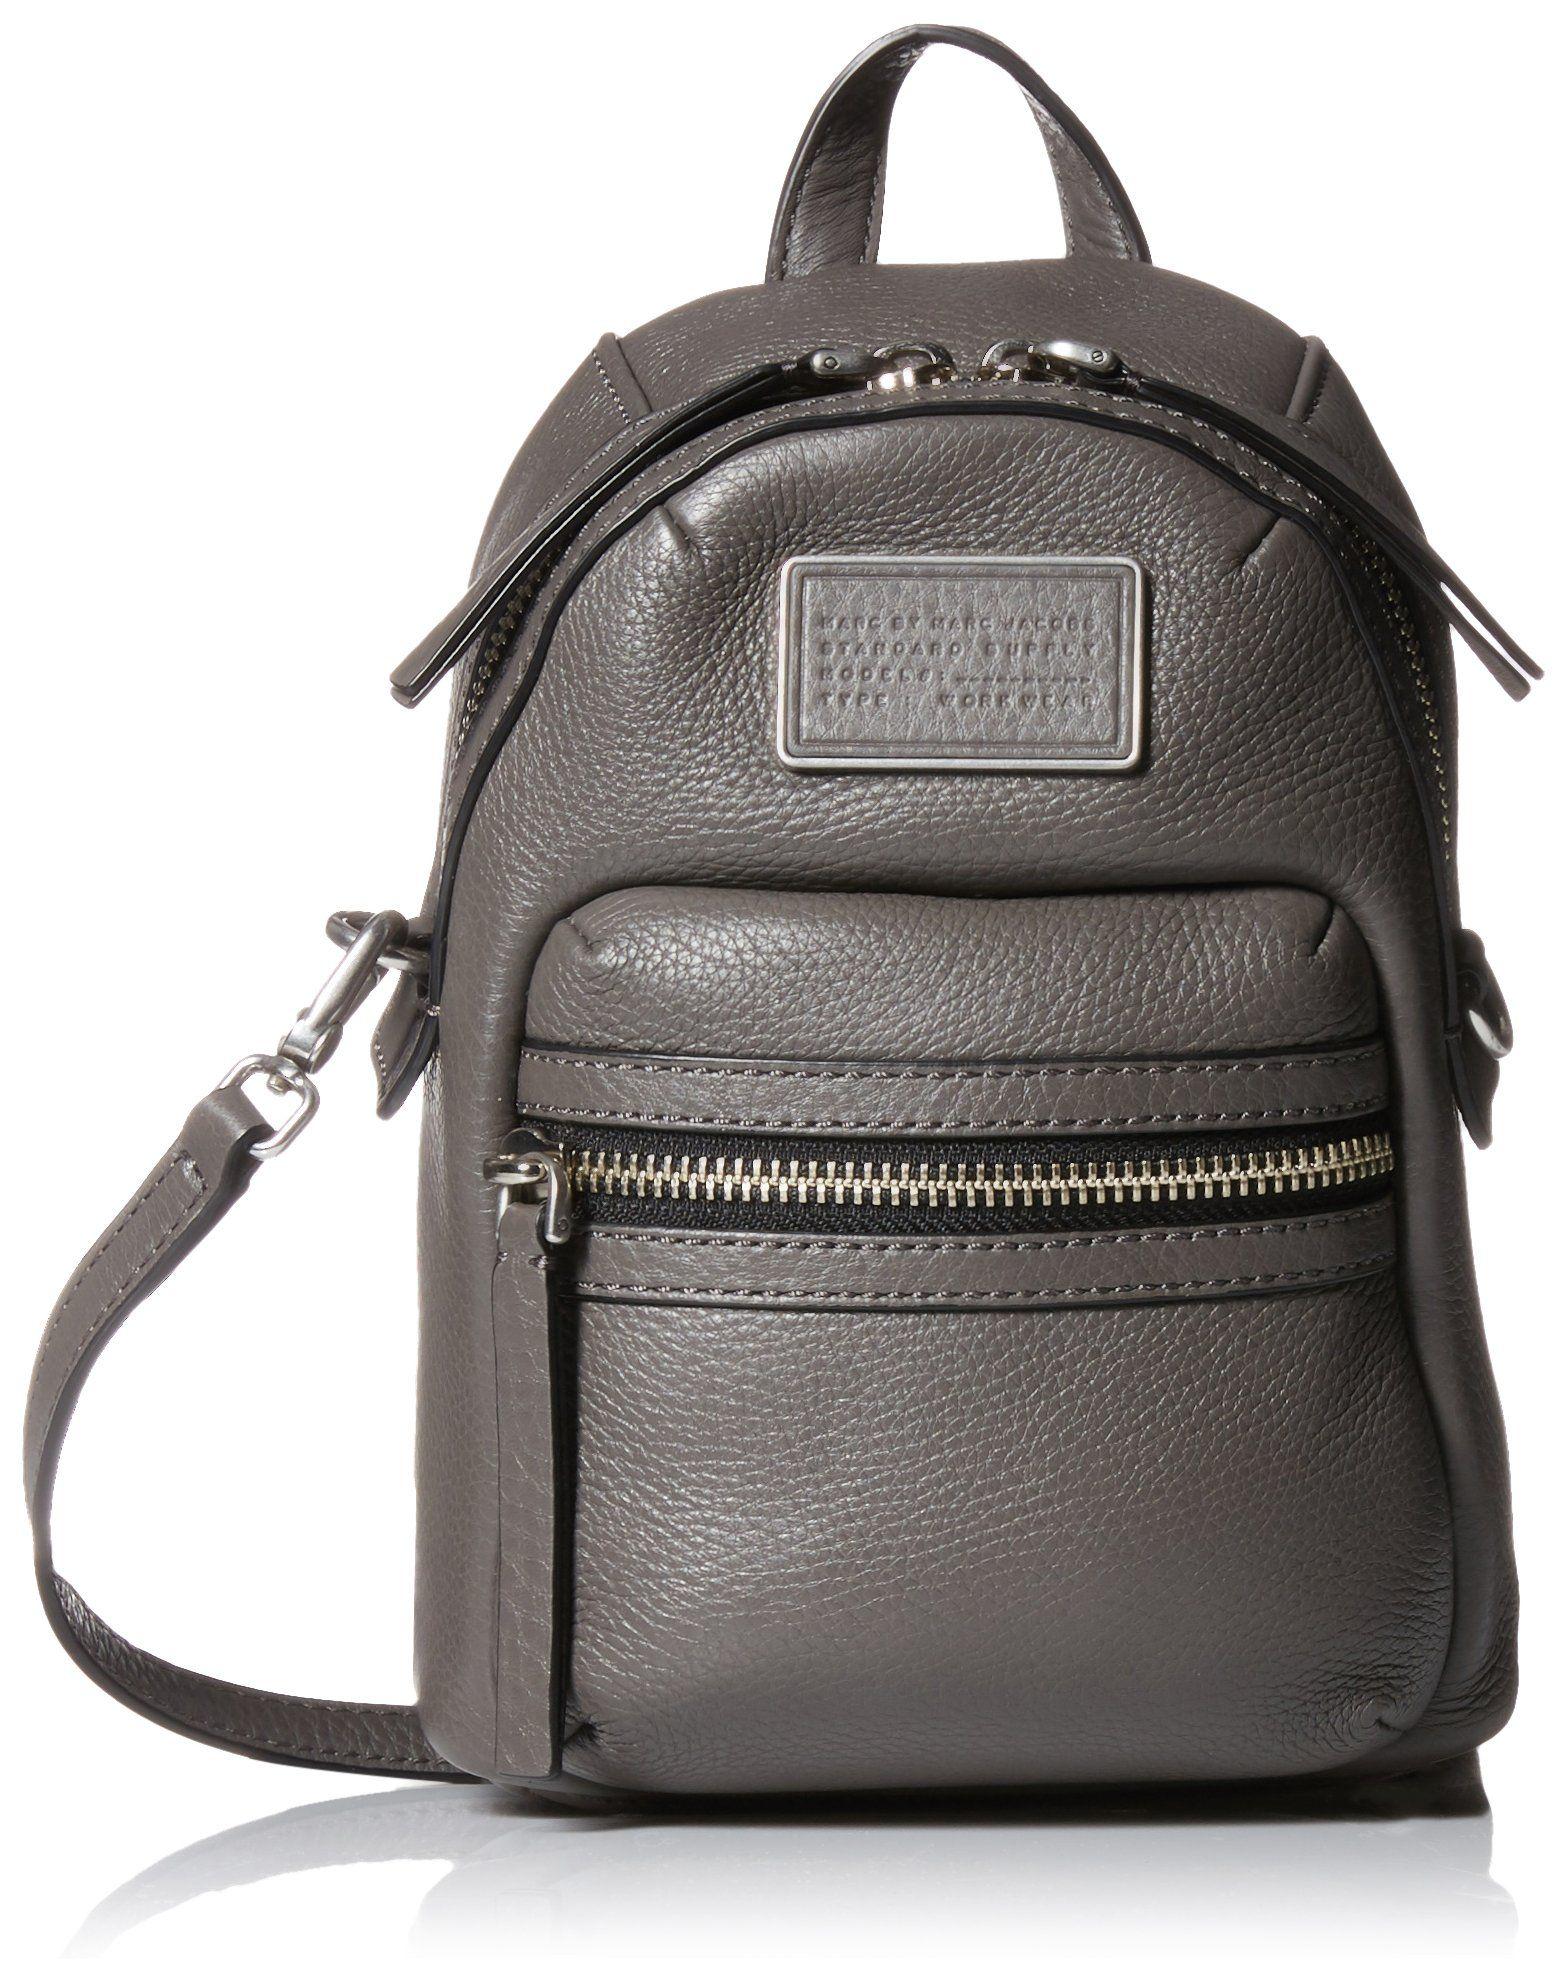 Amazon.com: Marc by Marc Jacobs Domo Biker Cross Biker Cross Body Bag, Black, One Size: Clothing